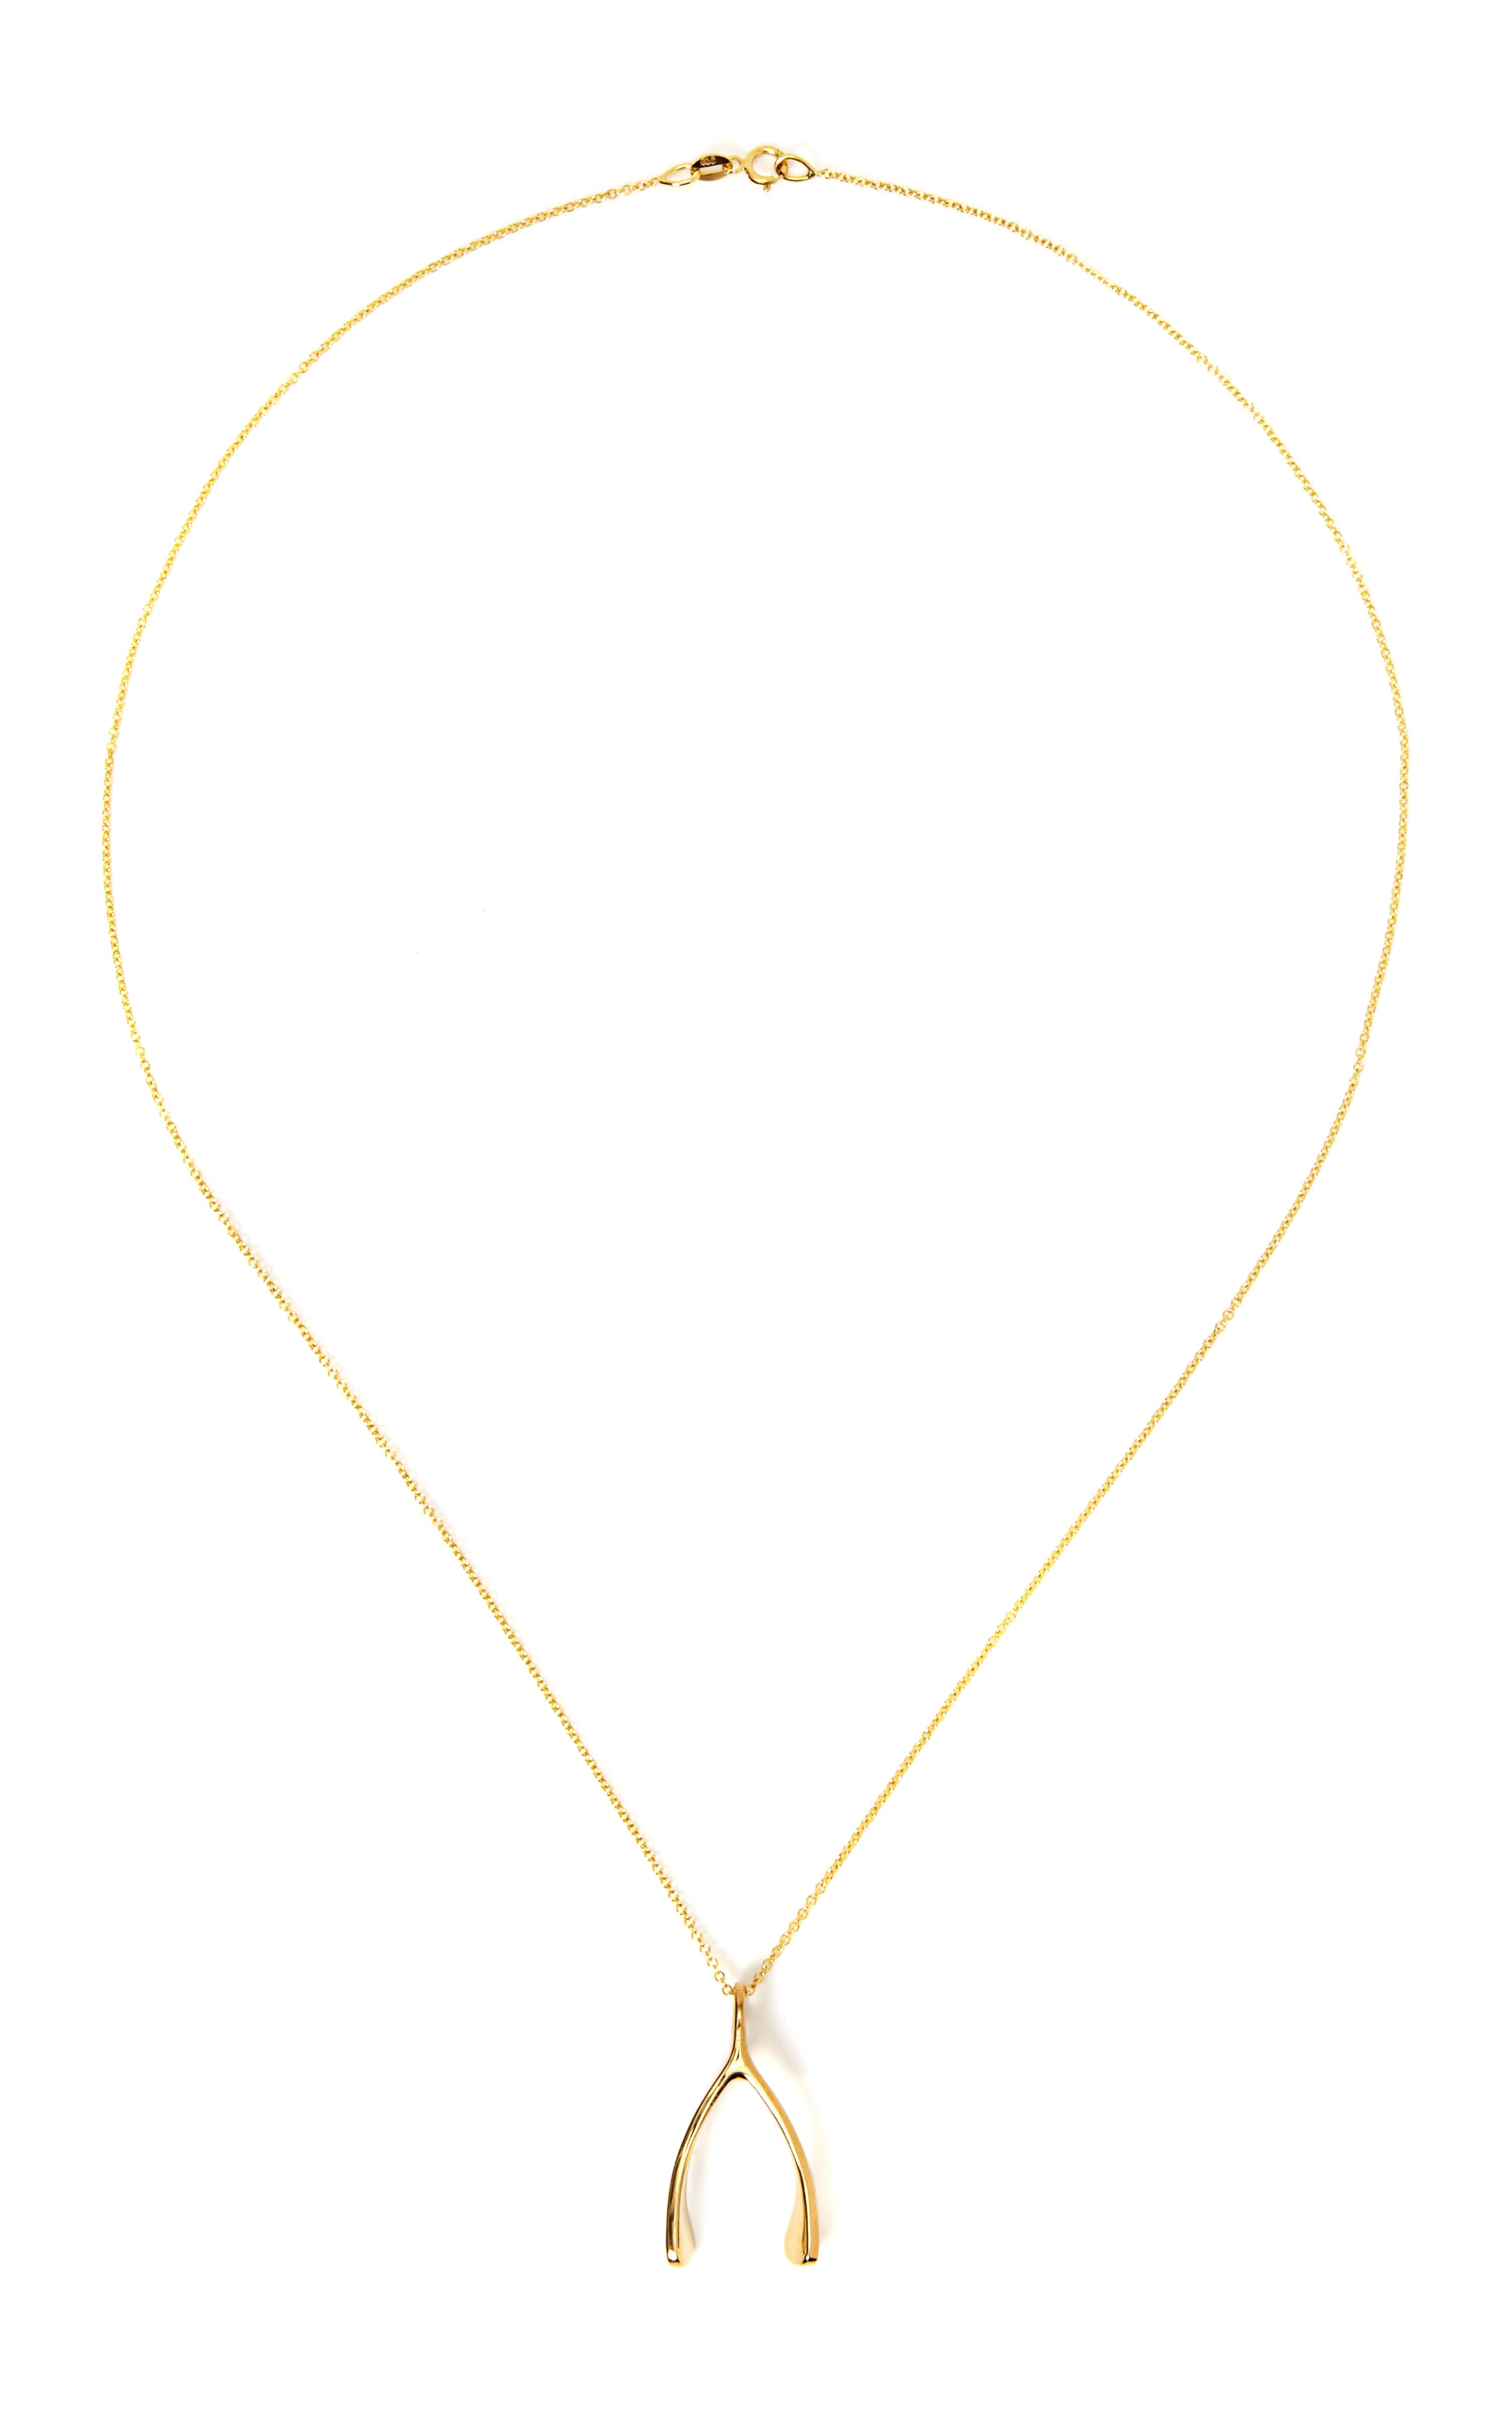 Lyst jennifer meyer 18k yellow gold wishbone necklace in metallic gallery aloadofball Image collections